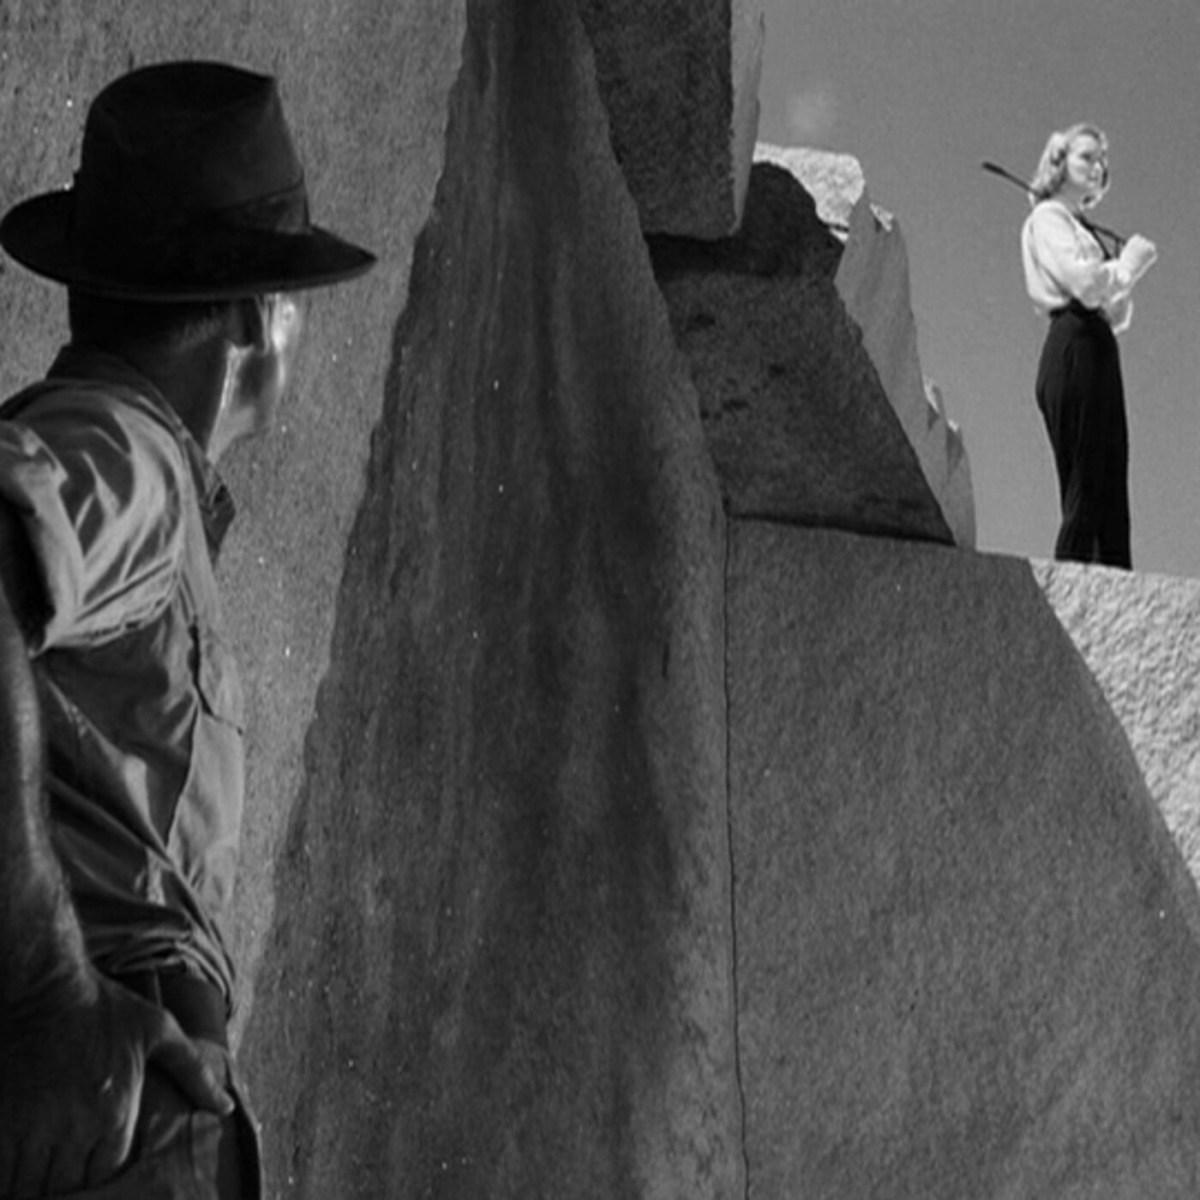 CSLM 444 – Dossier Zack Snyder (XI): El manantial (King Vidor, 1949)